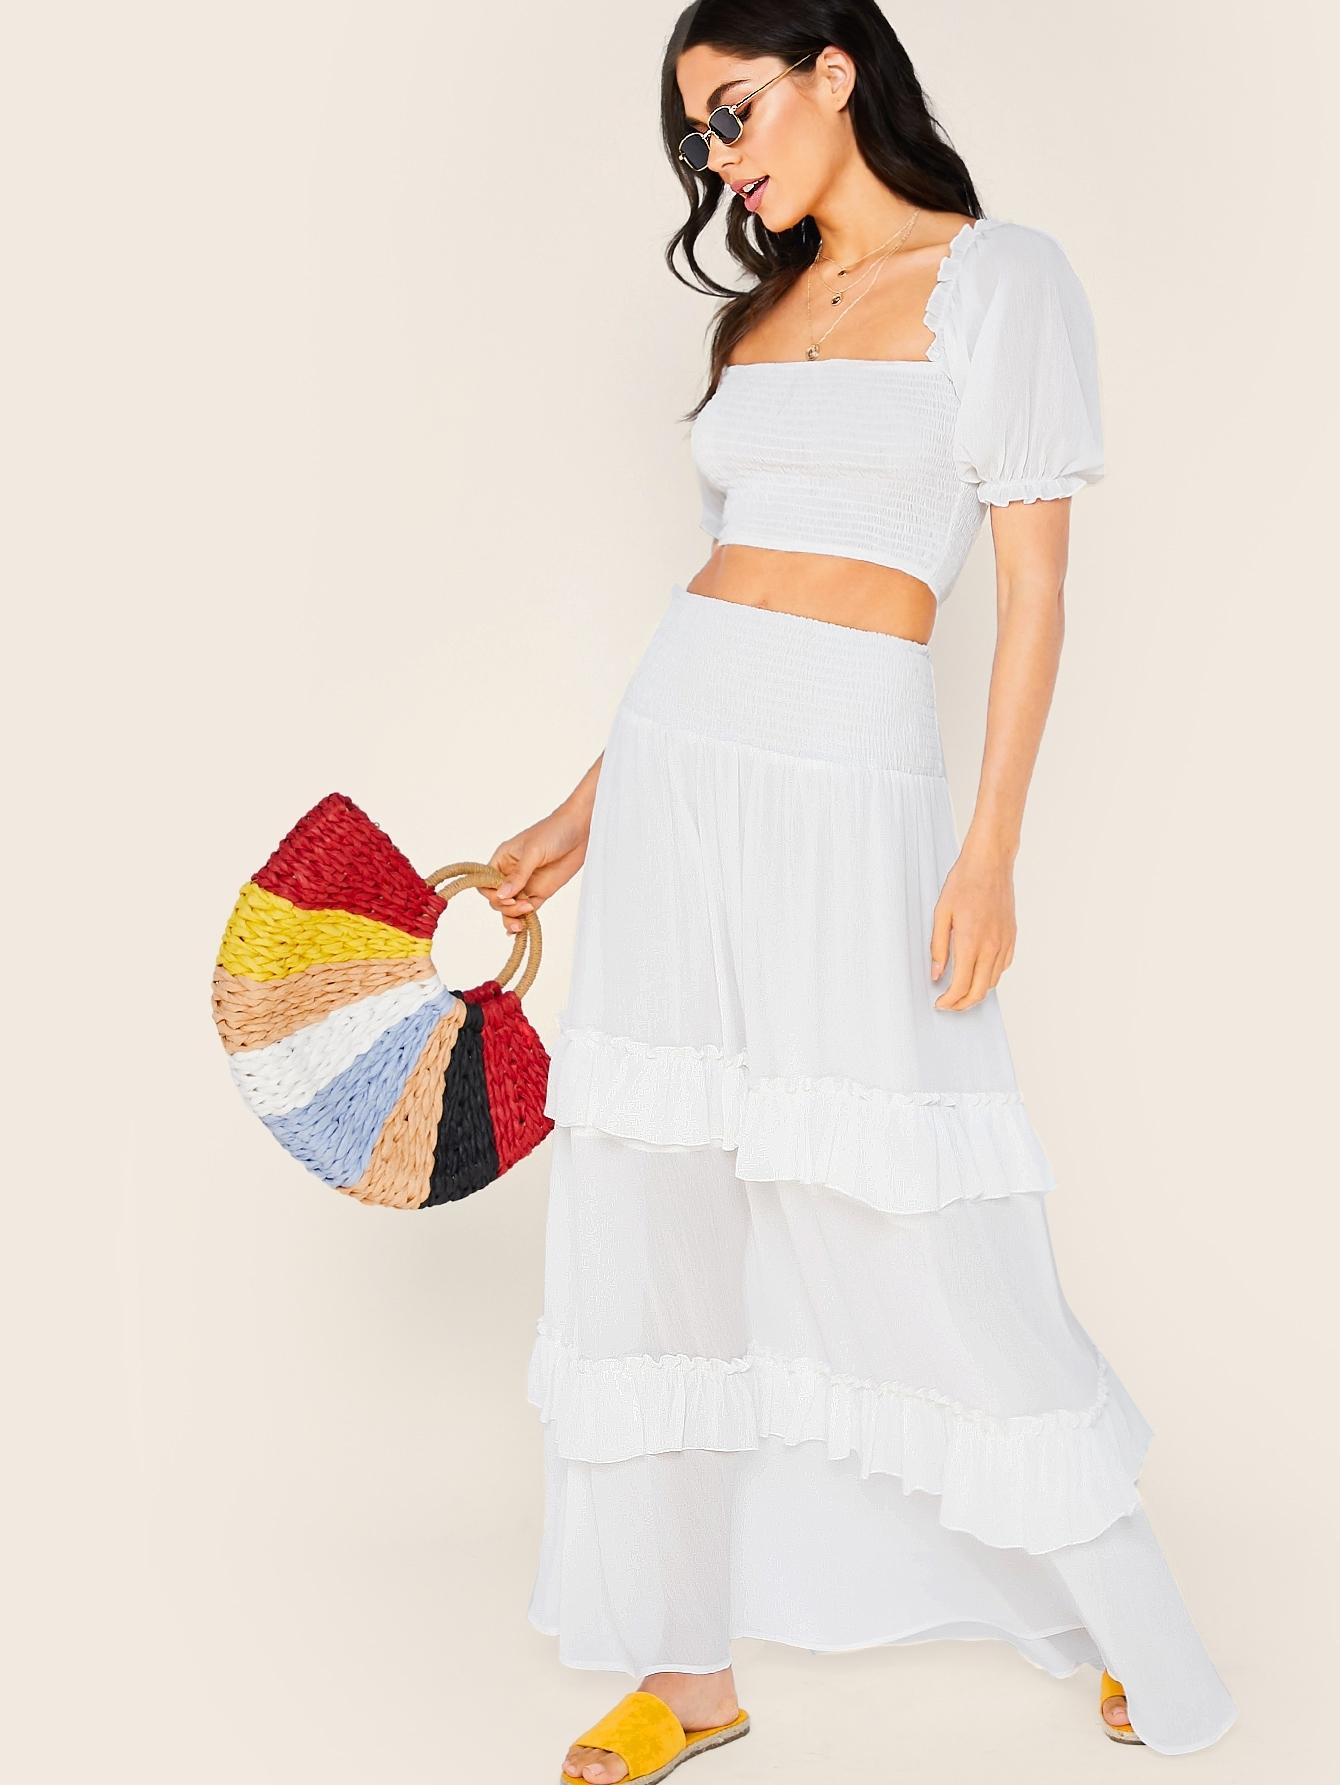 Фото - Длинная юбка и топ с рюшами от SheIn белого цвета